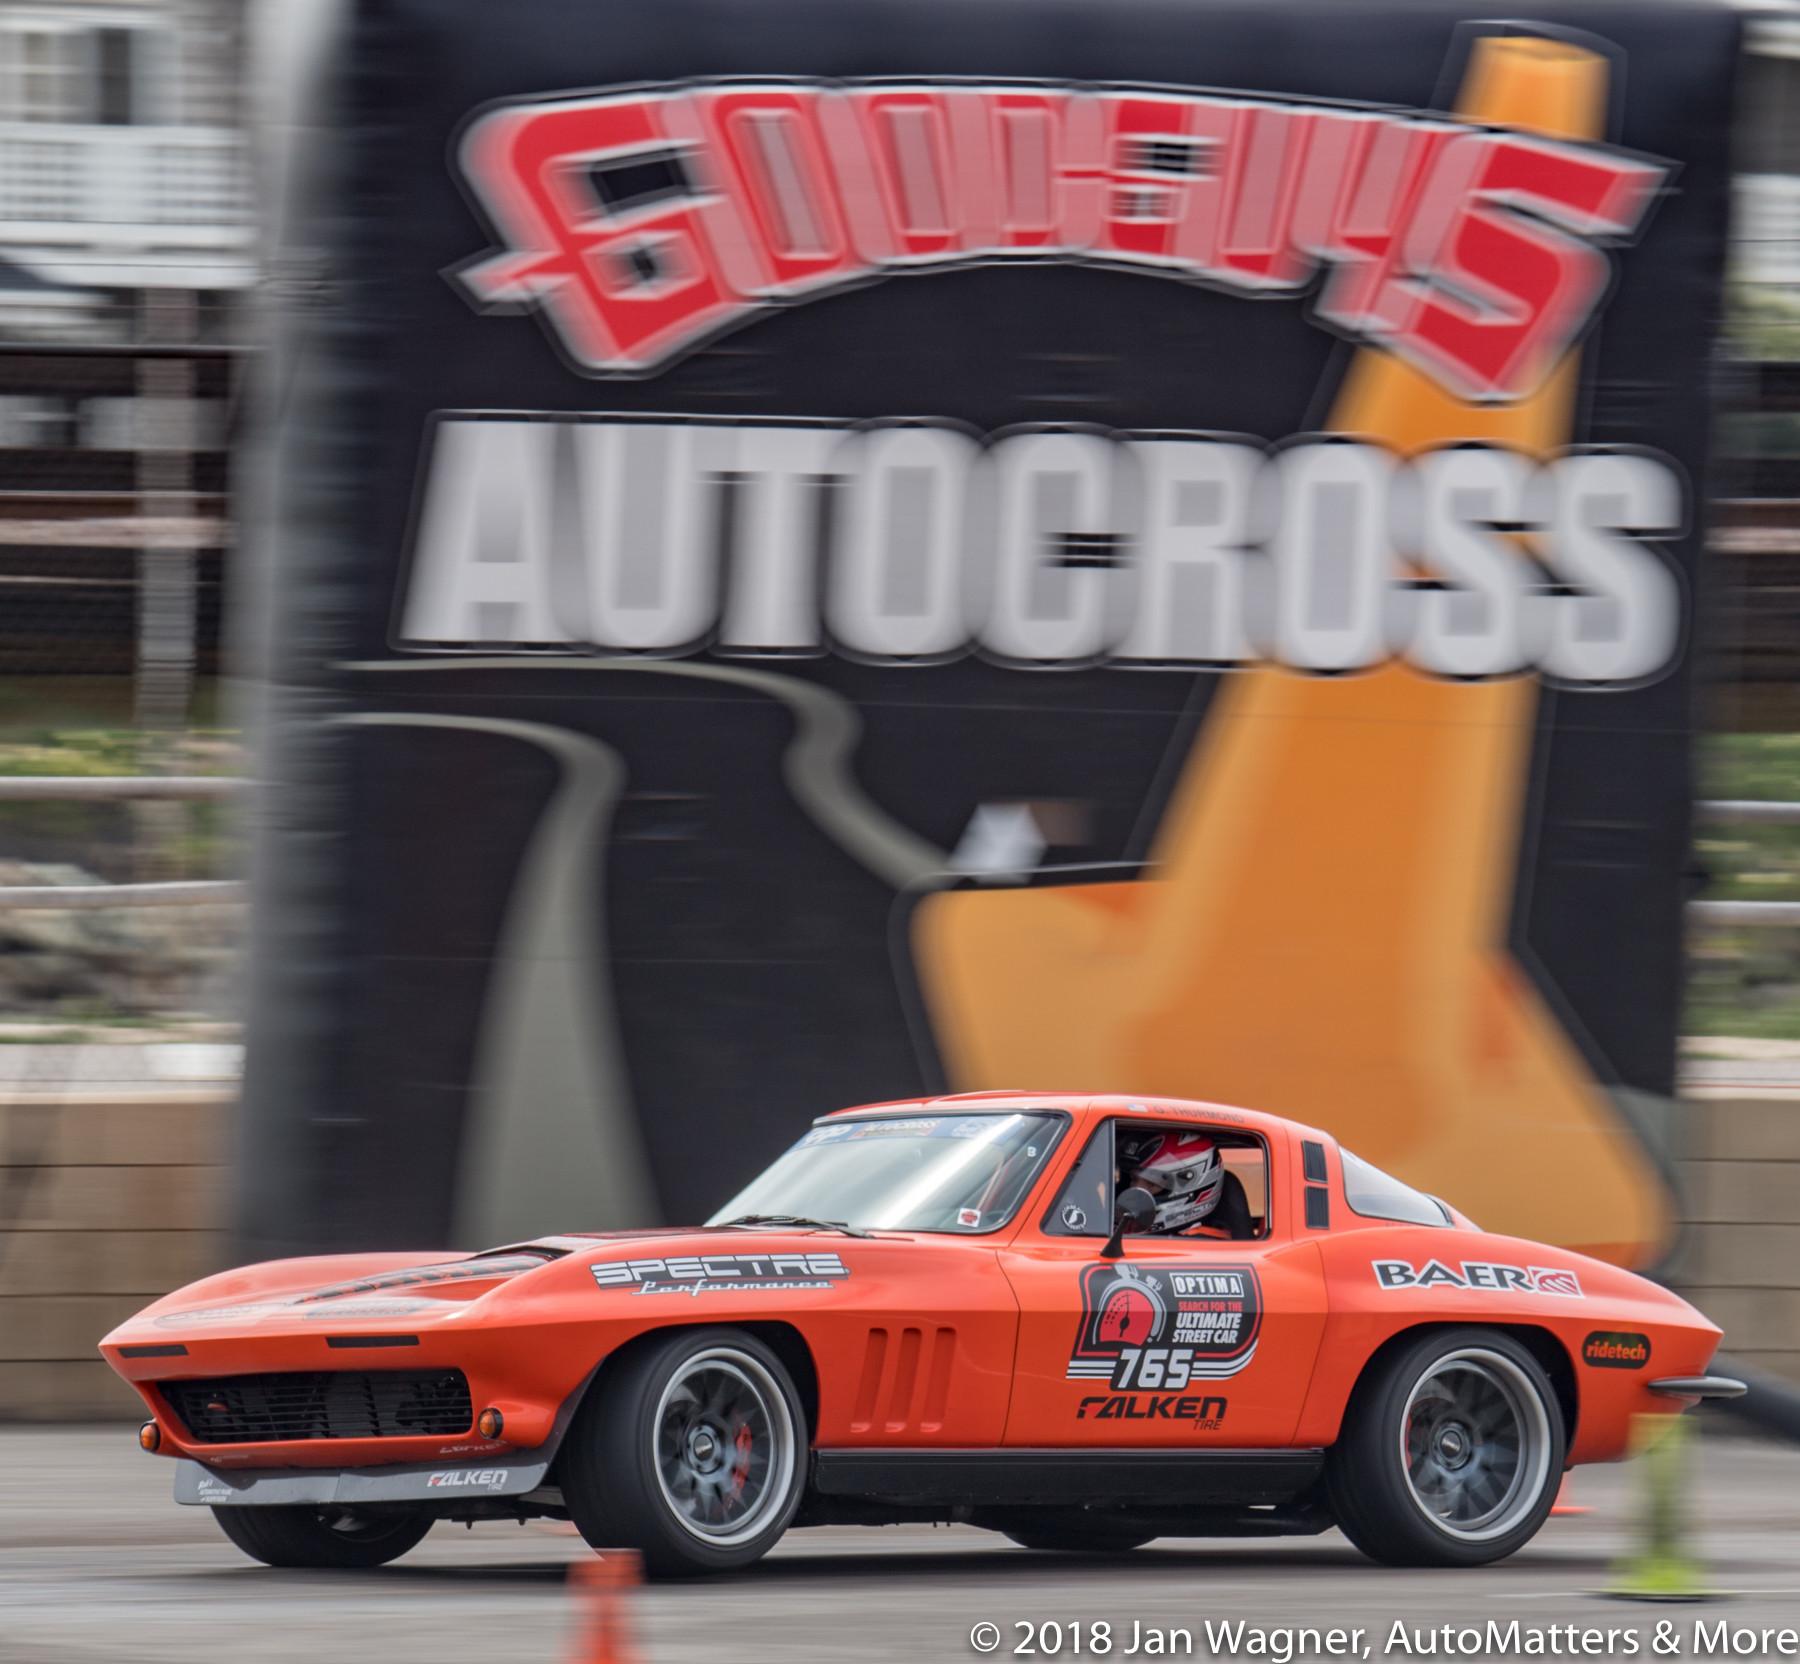 Corvette Goodguys